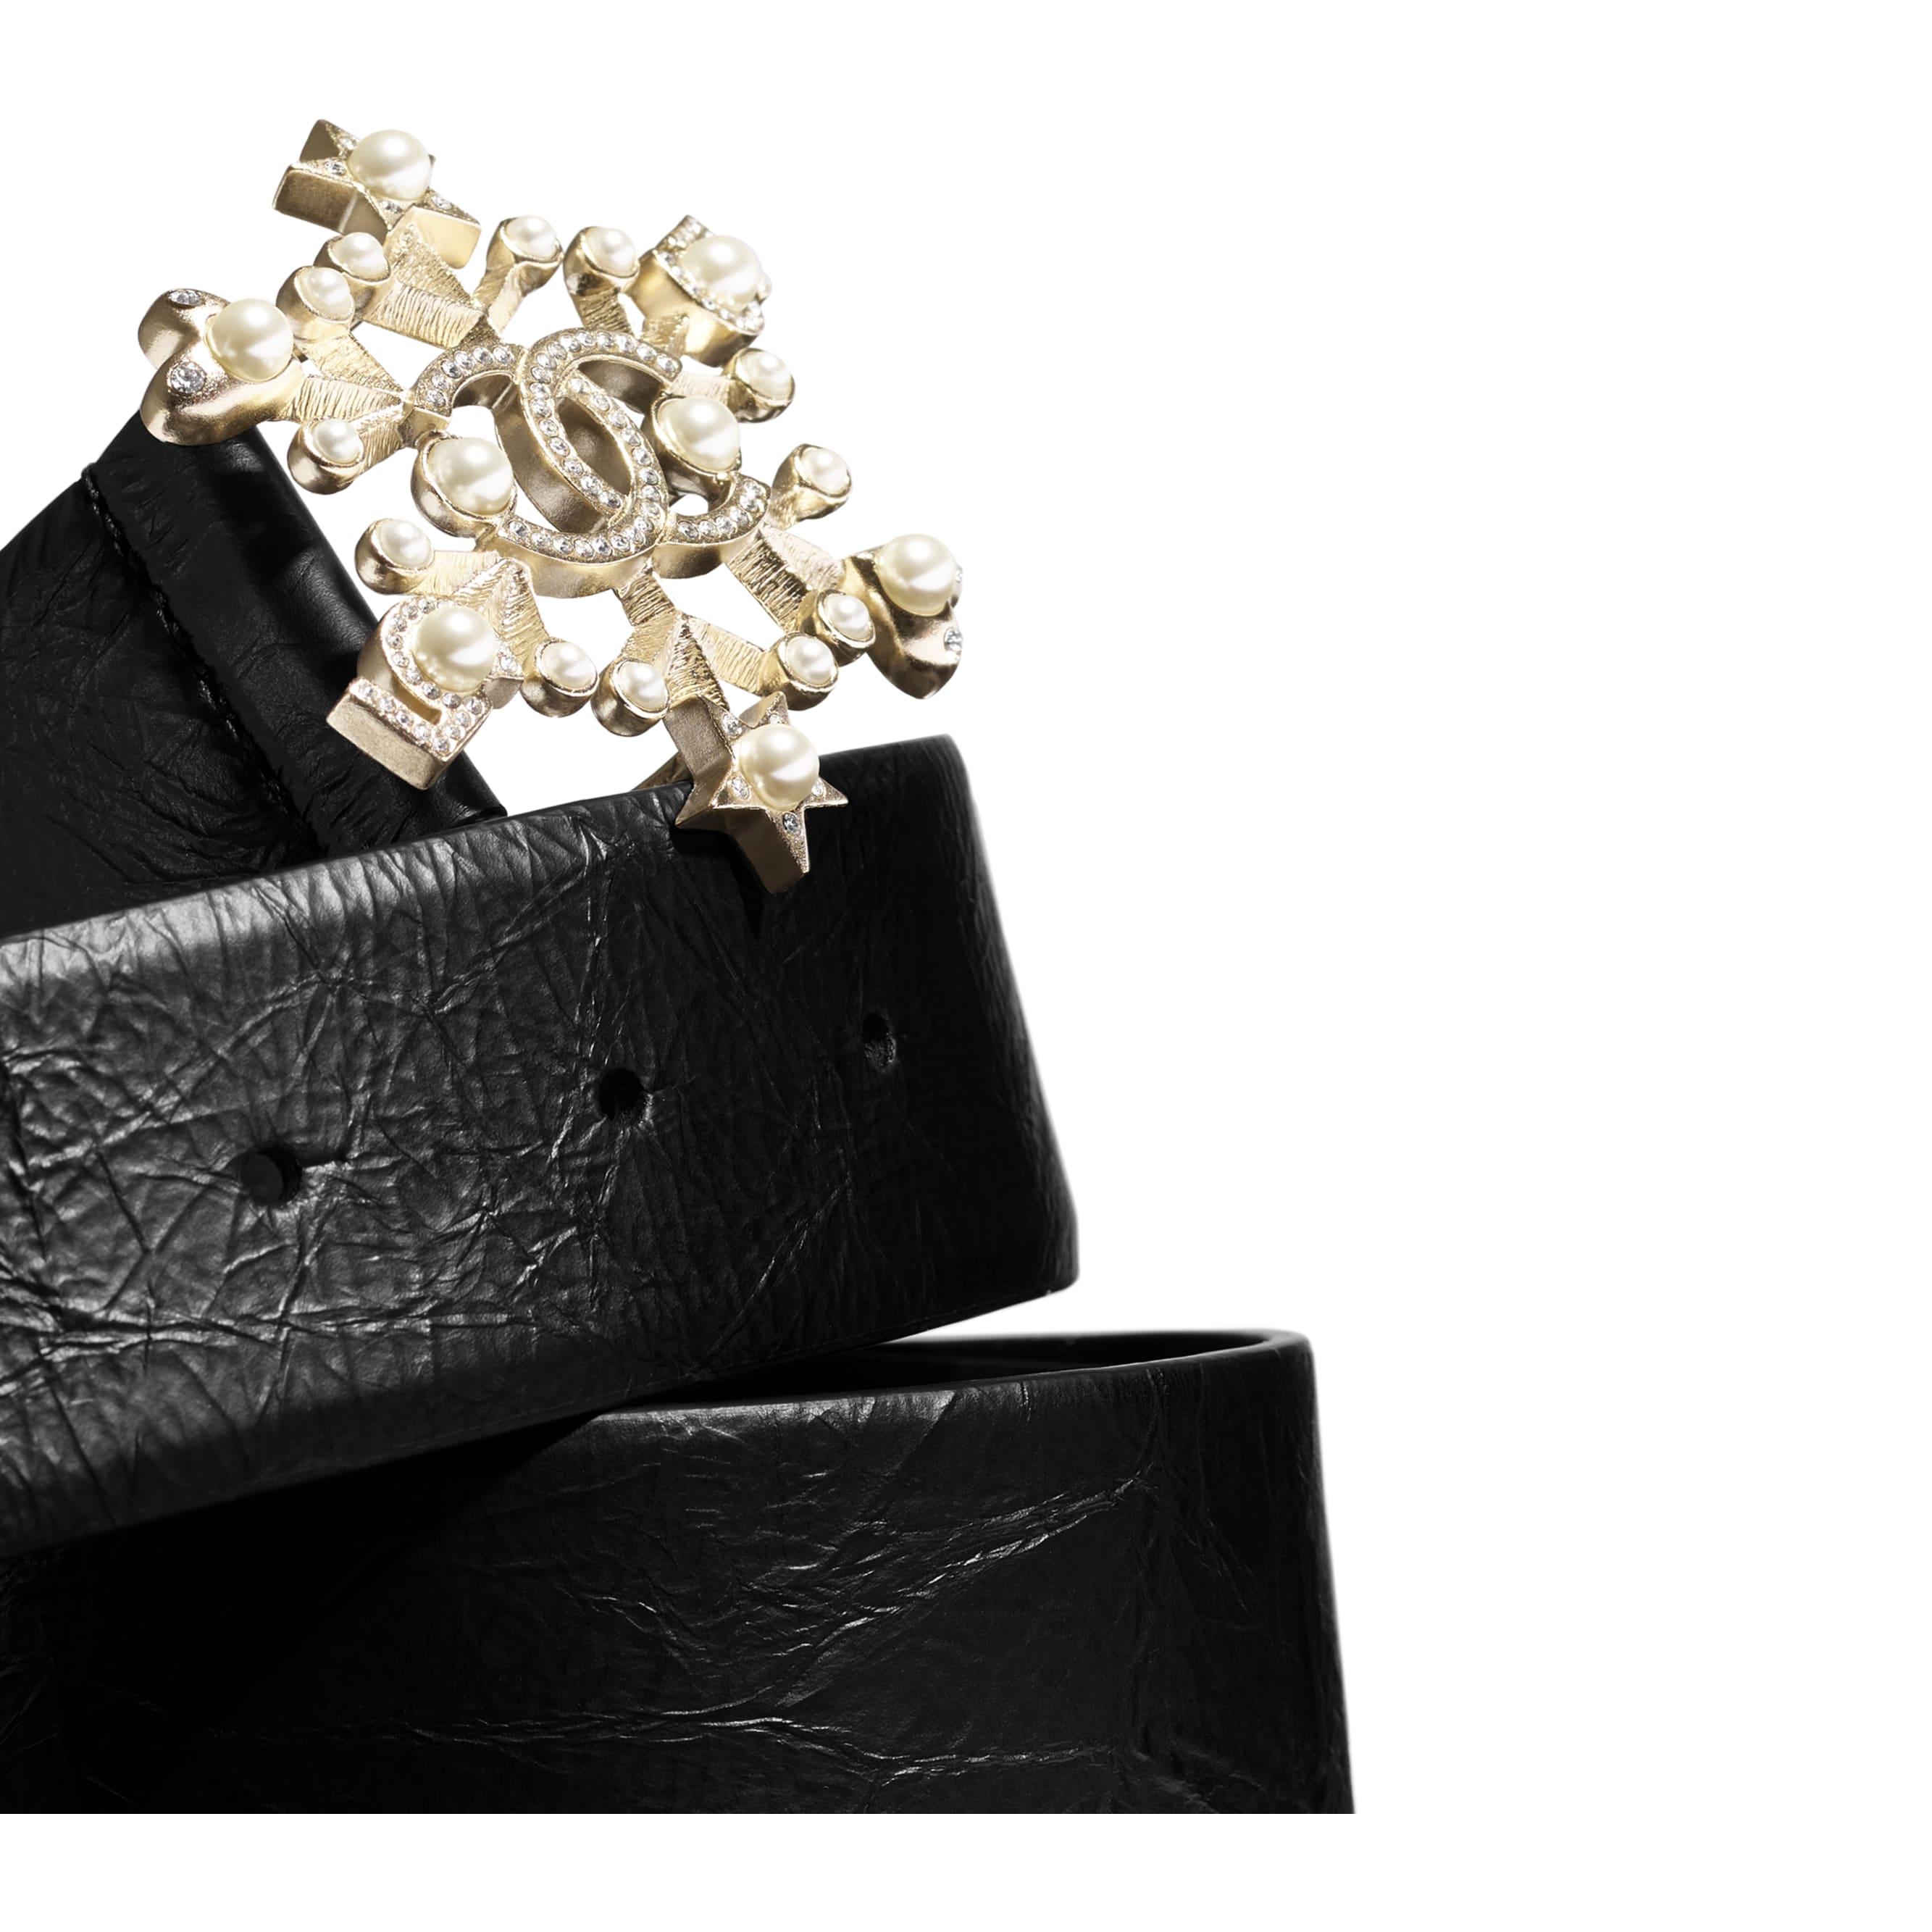 Belt - Black, Pearly White & Crystal - Calfskin, Gold-Tone Metal, Diamanté  & Glass - Alternative view - see standard sized version